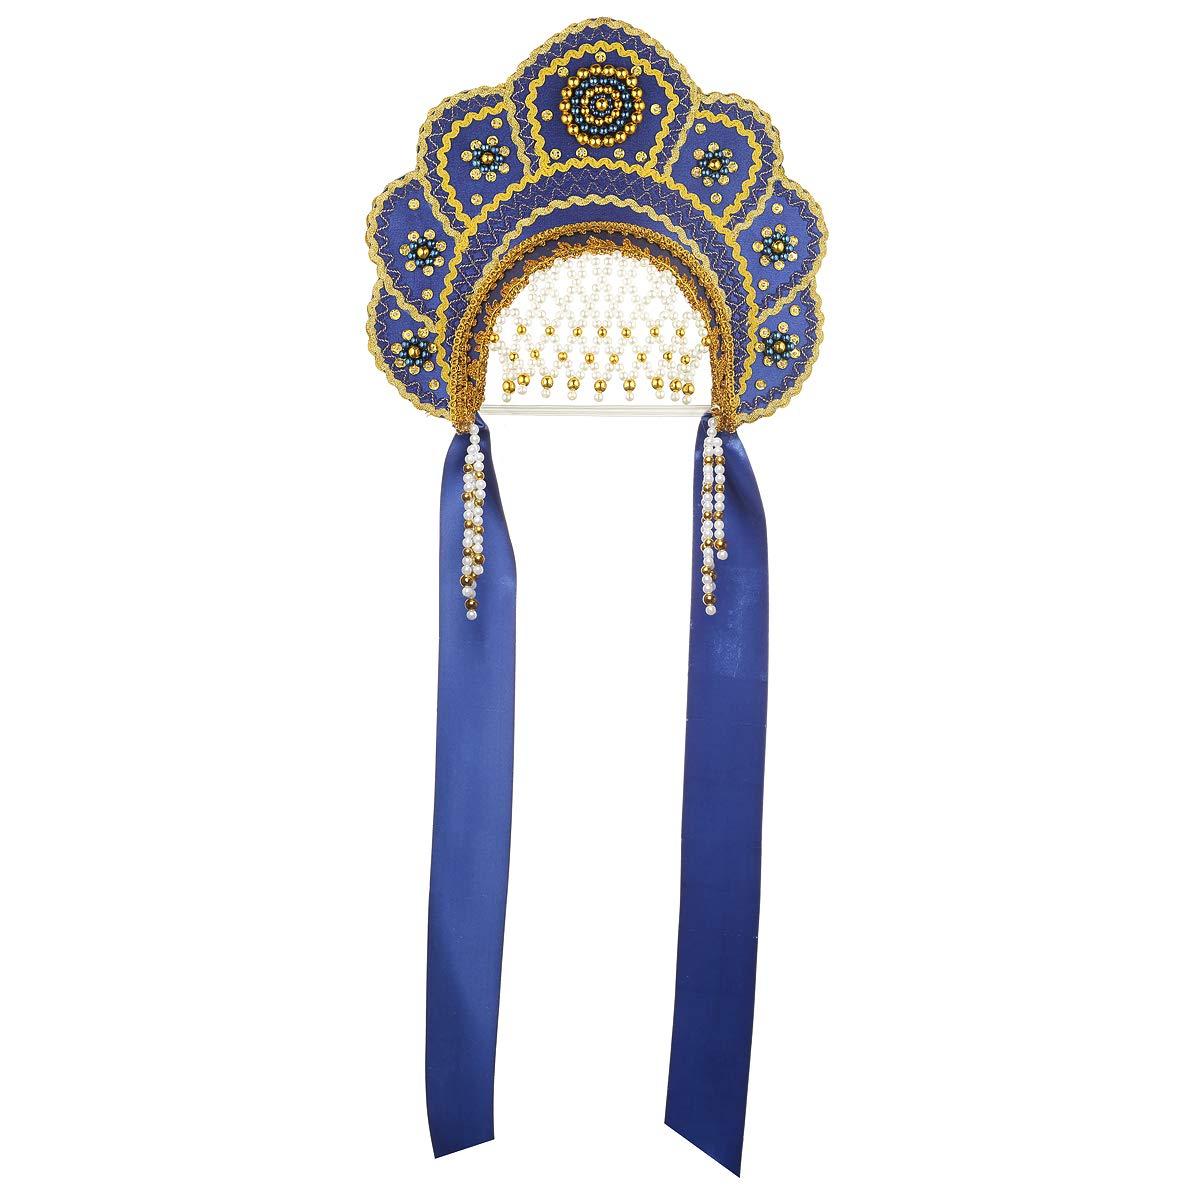 Russian Traditional Folk Costume Headdress Kokoshnik''Elena'' Blue #291 by danila-souvenirs